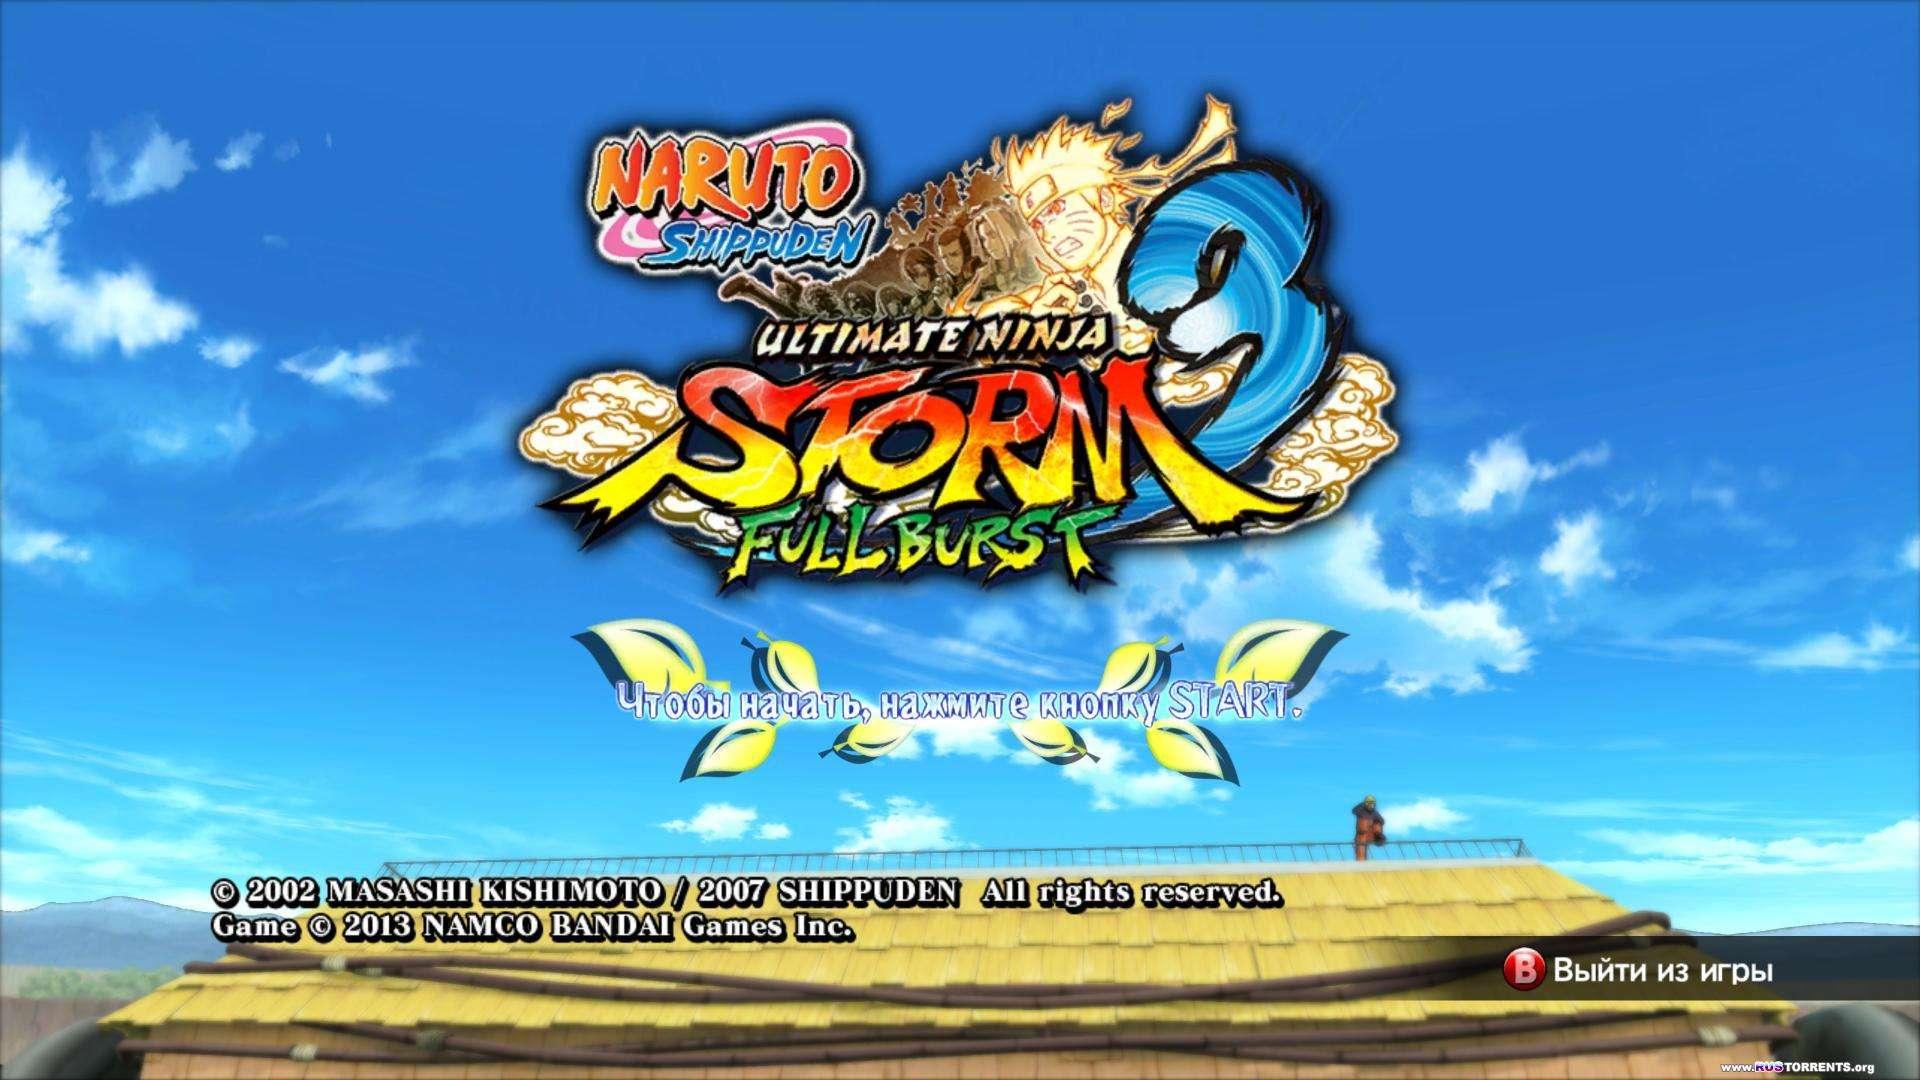 NARUTO SHIPPUDEN: Ultimate Ninja STORM 3 Full Burst | РС | RePack от xatab